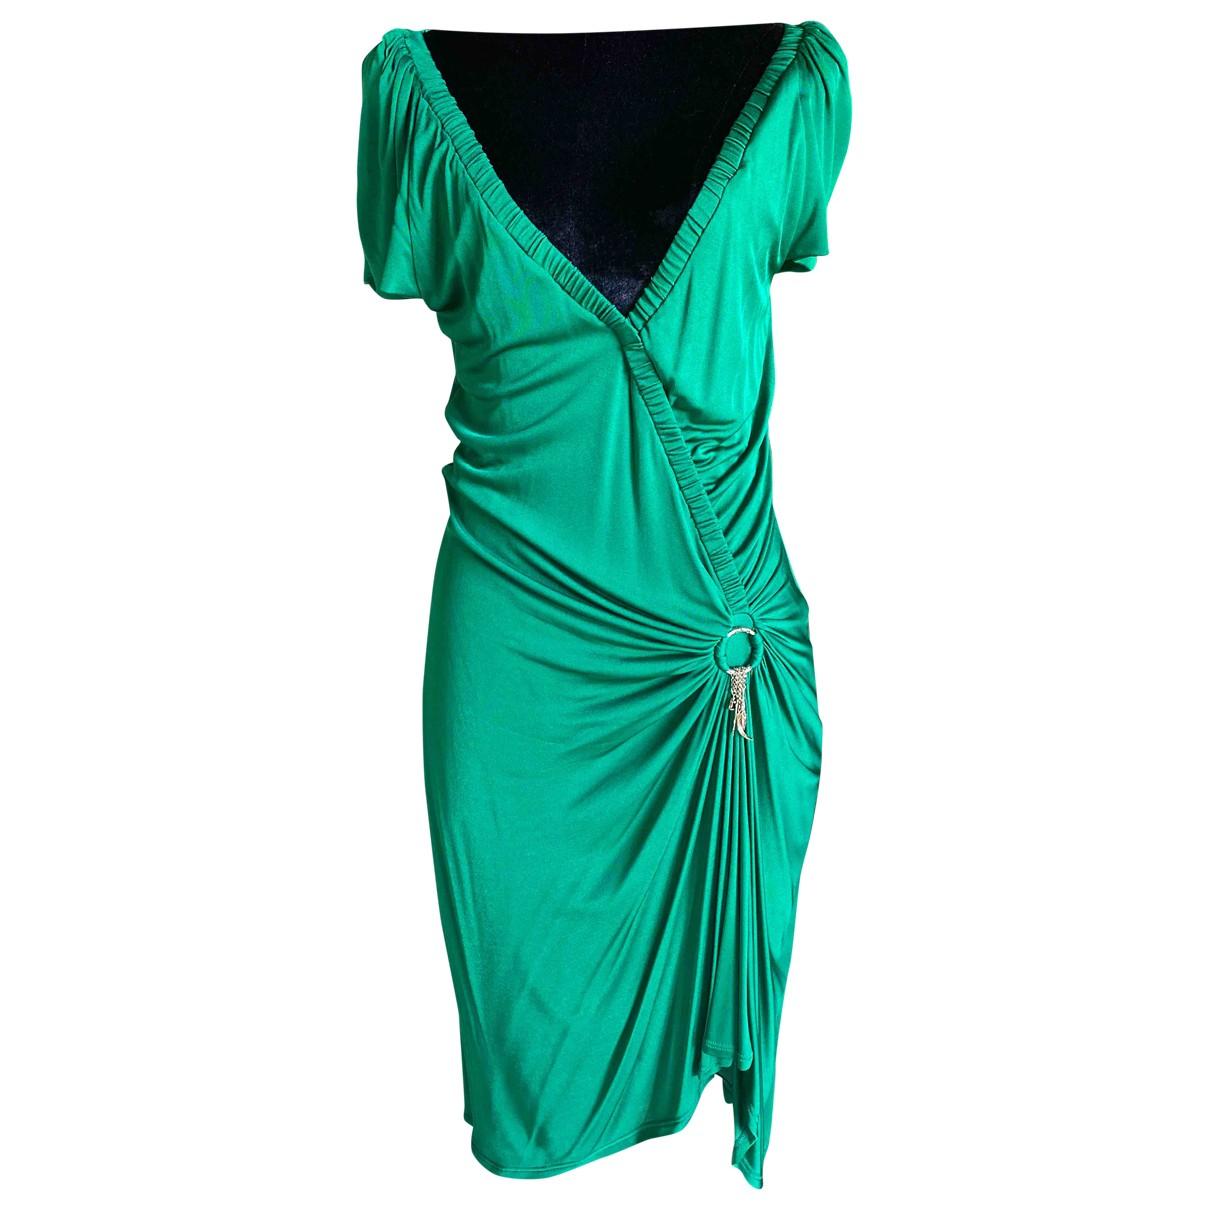 Roberto Cavalli \N Green dress for Women 42 IT